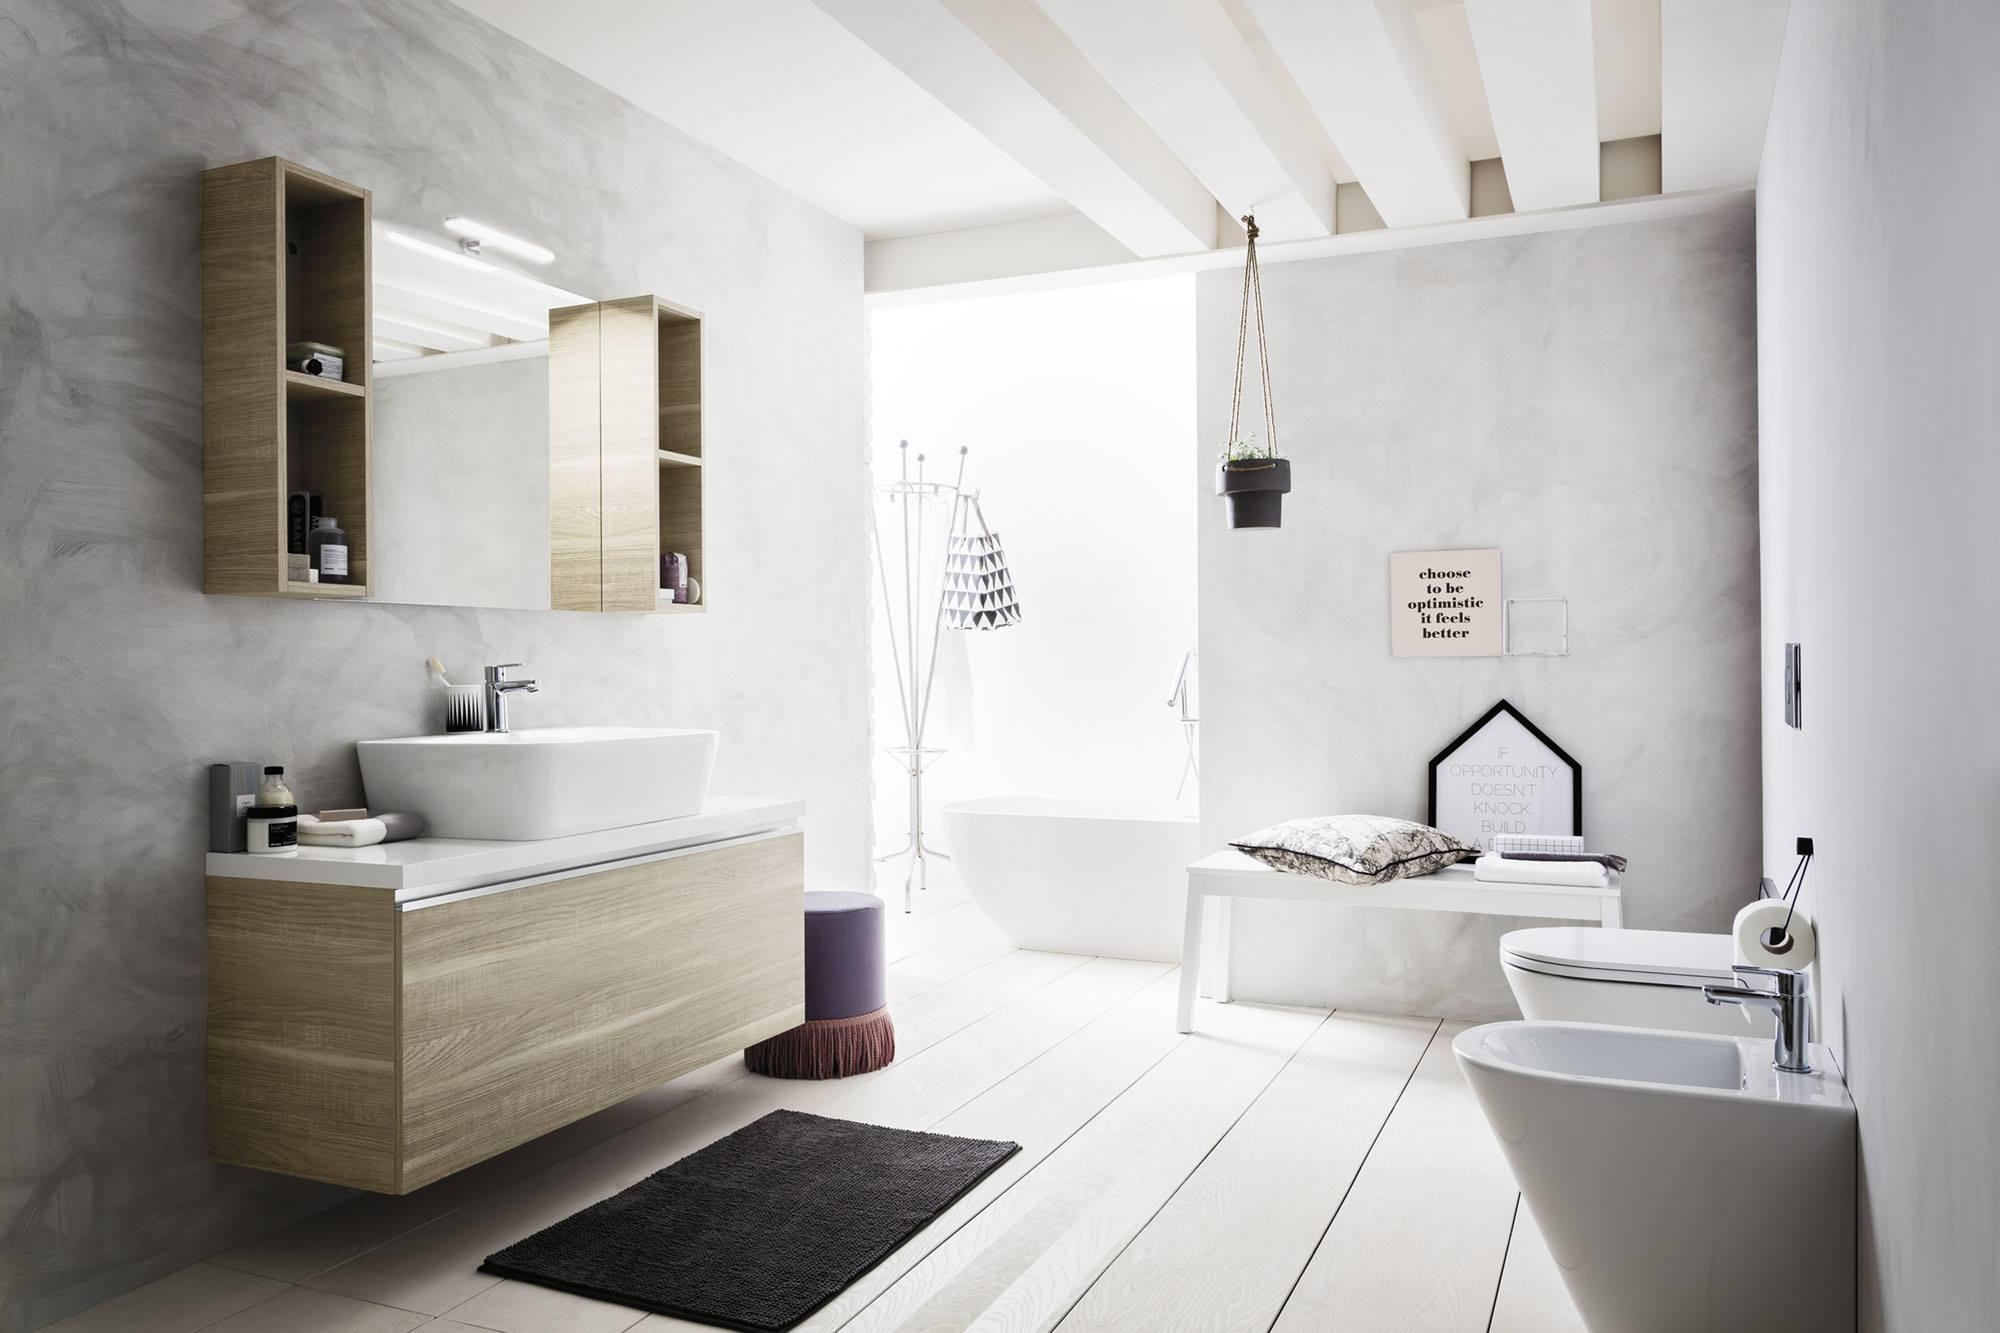 Pittura per bagno senza piastrelle elegant sanitari neri arredo bagno with pittura per bagno - Pittura per piastrelle bagno ...